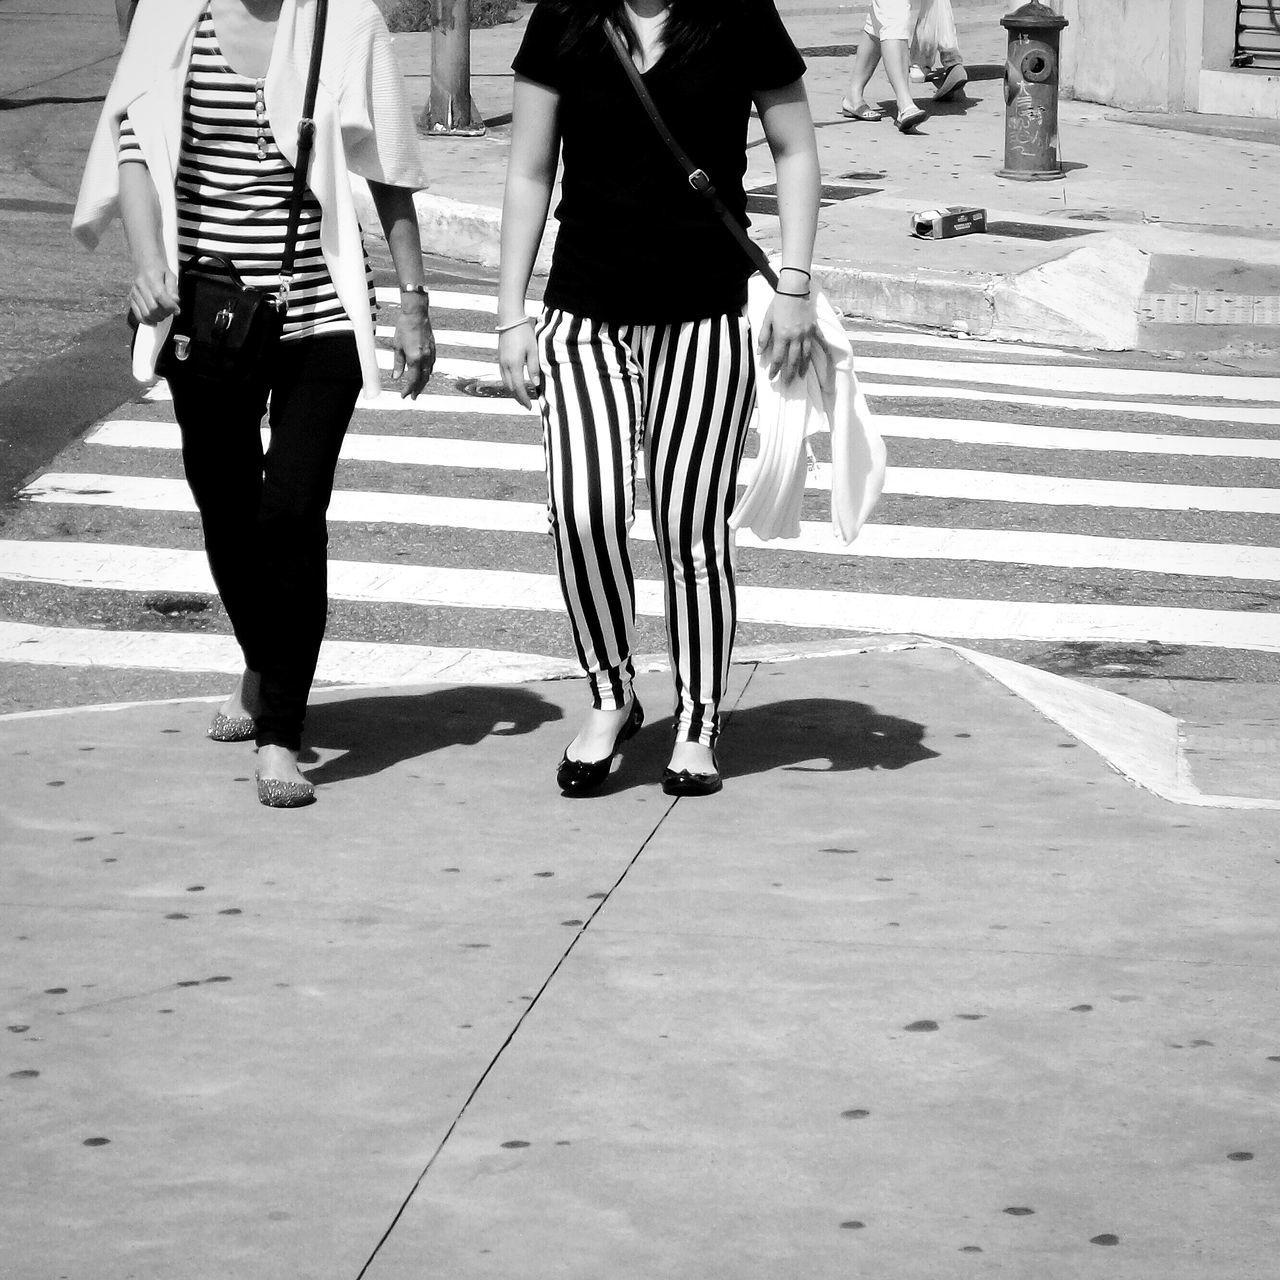 white stripes Open Edit Street Photography Streetphotography Streetphoto_bw Black & White Monochrome Candid Photography AMTPt_community EyeEm Best Shots Capture The Moment